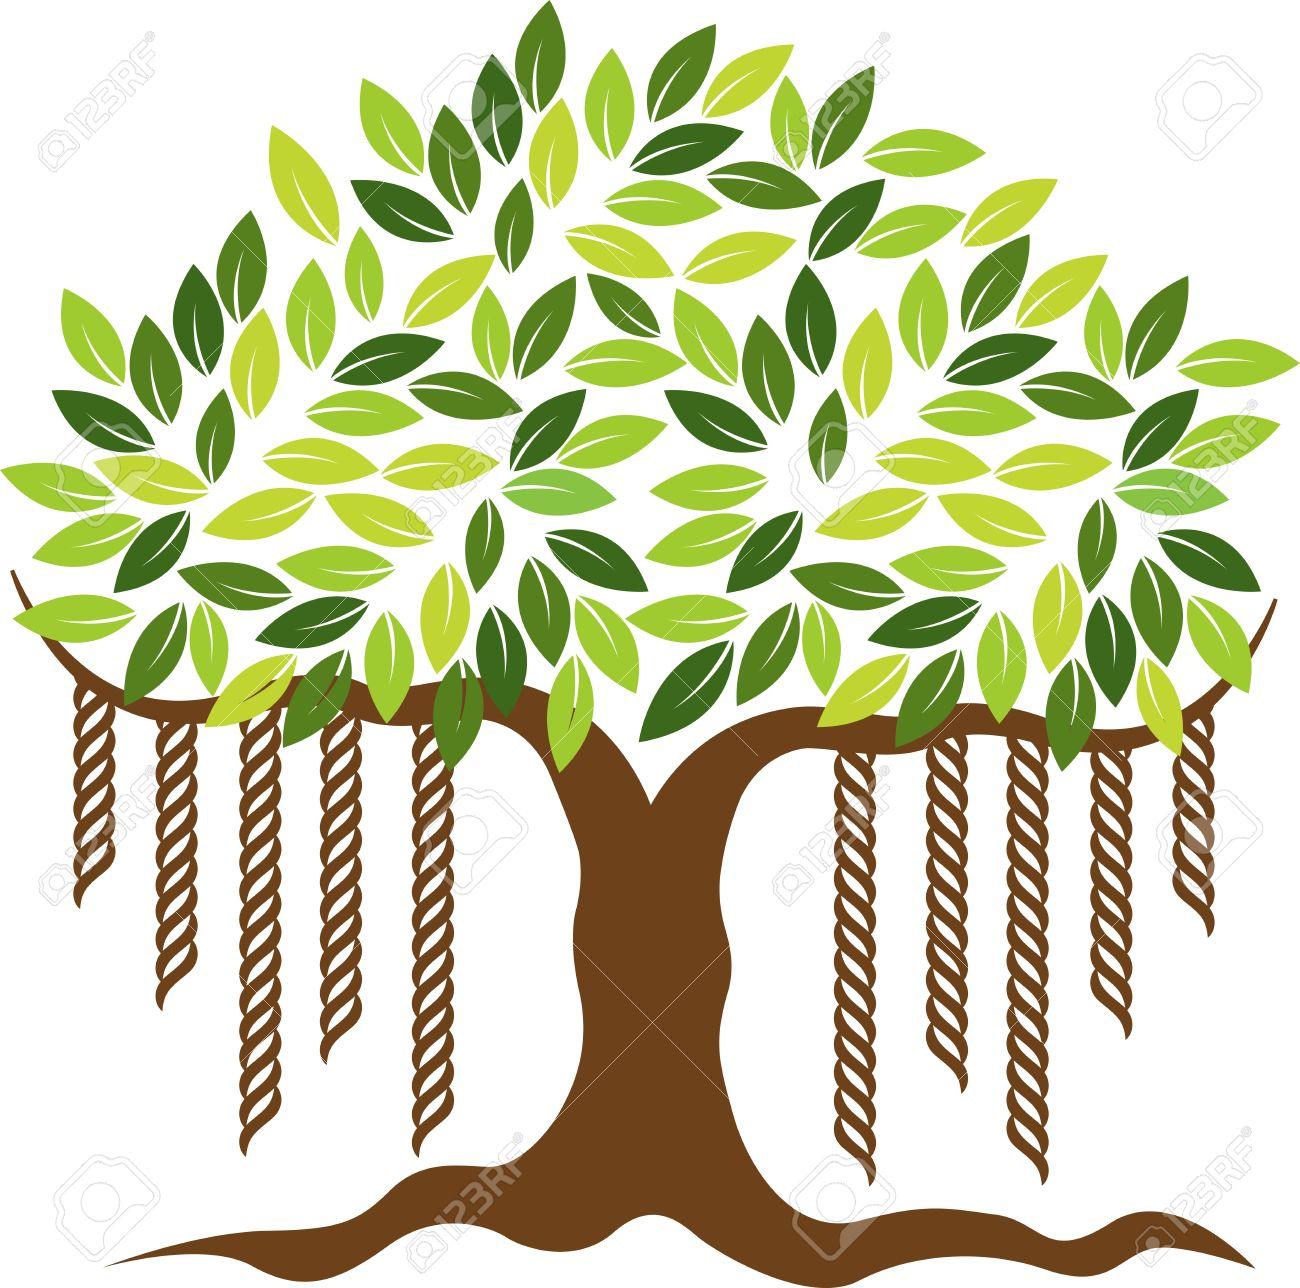 1300x1288 Clipart Of Banyan Tree